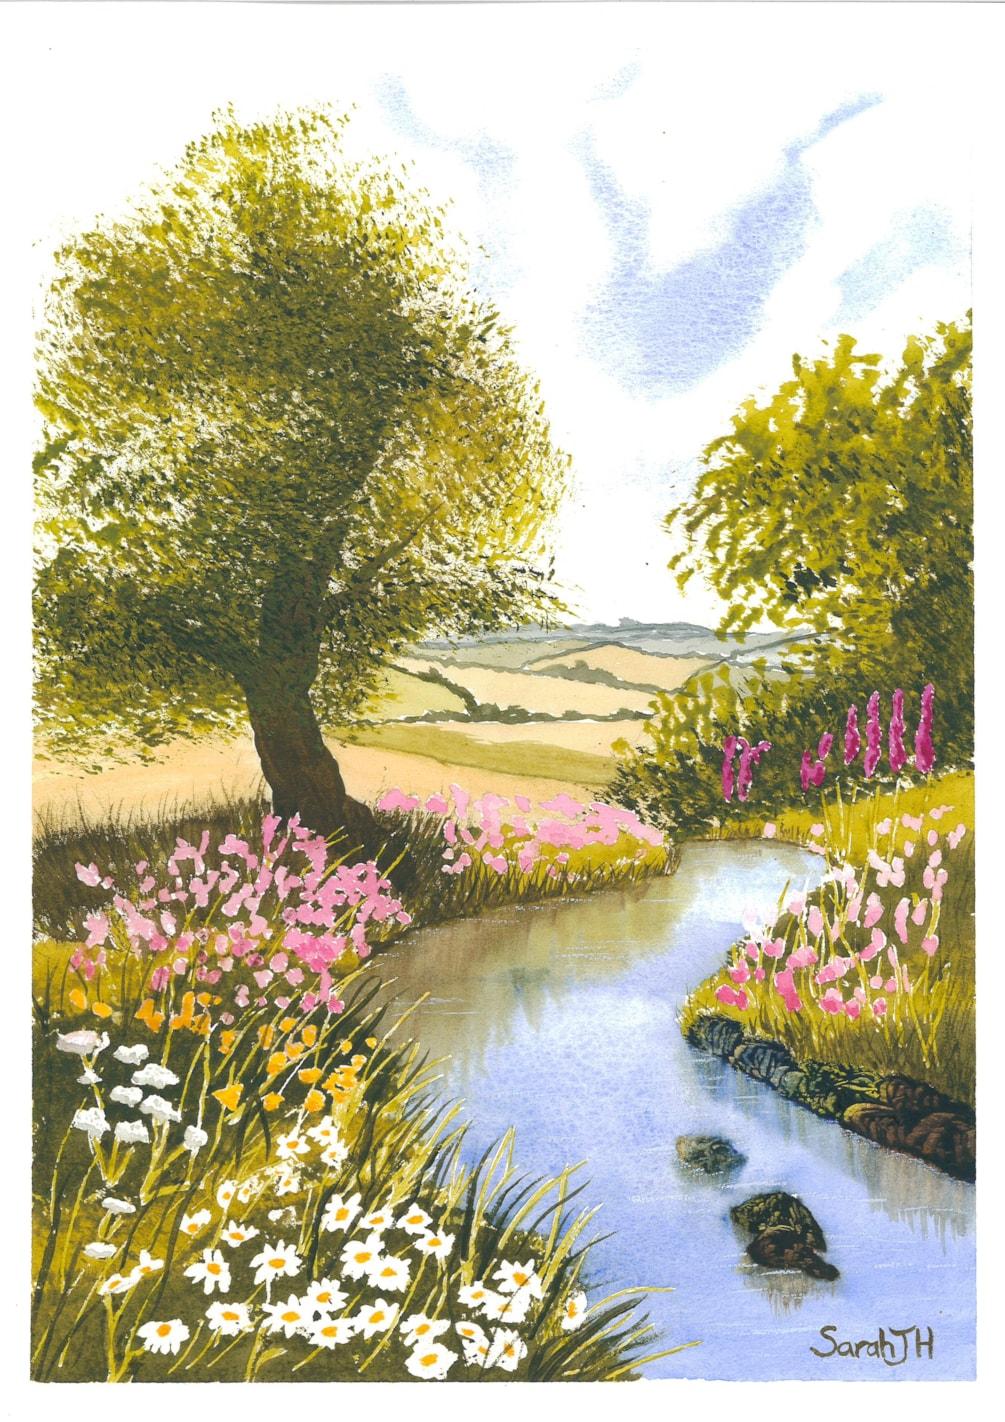 Floral Stream 2020-10-26